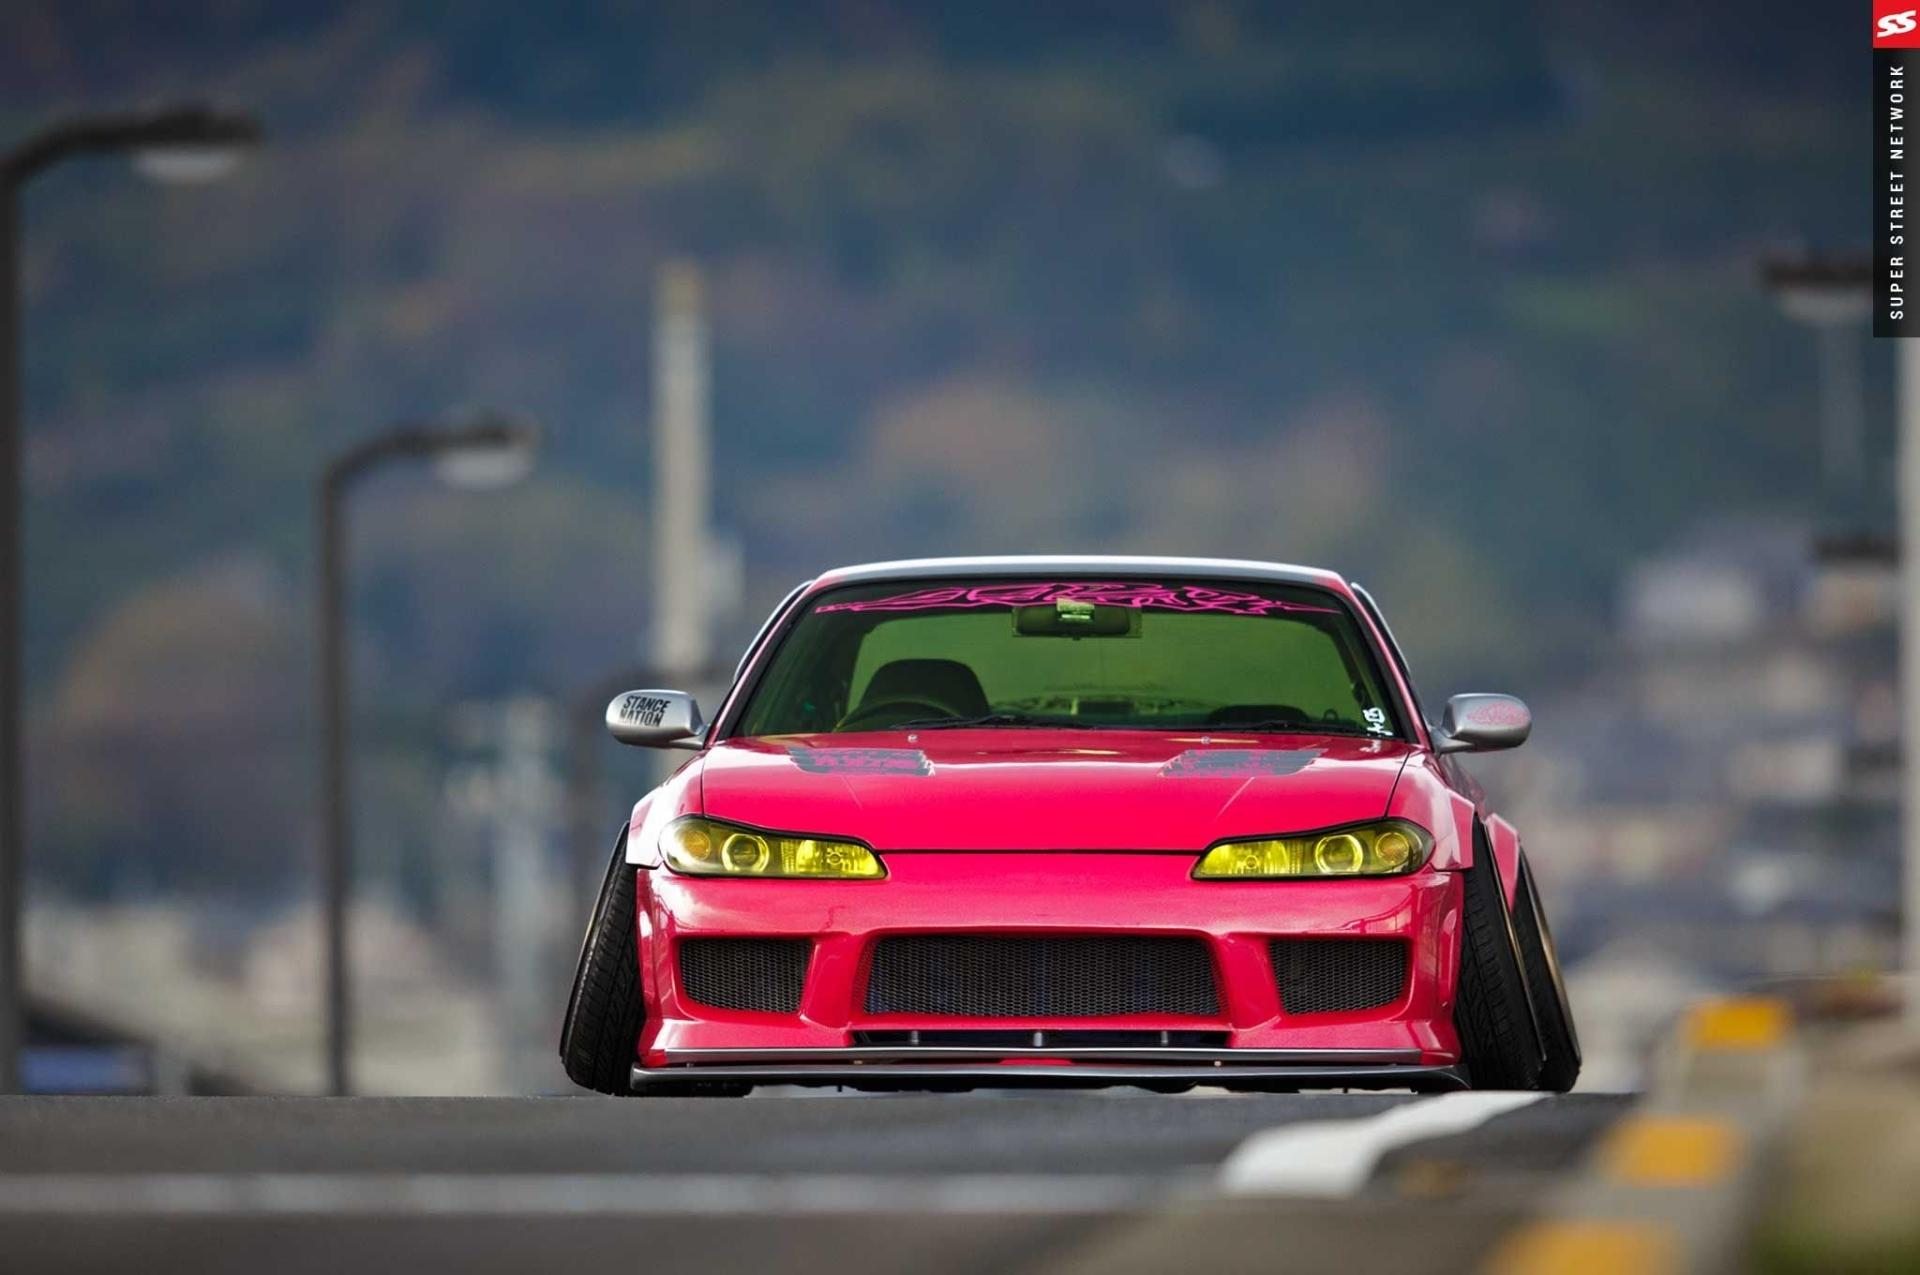 Nissan Silvia Wallpaper Hd Download